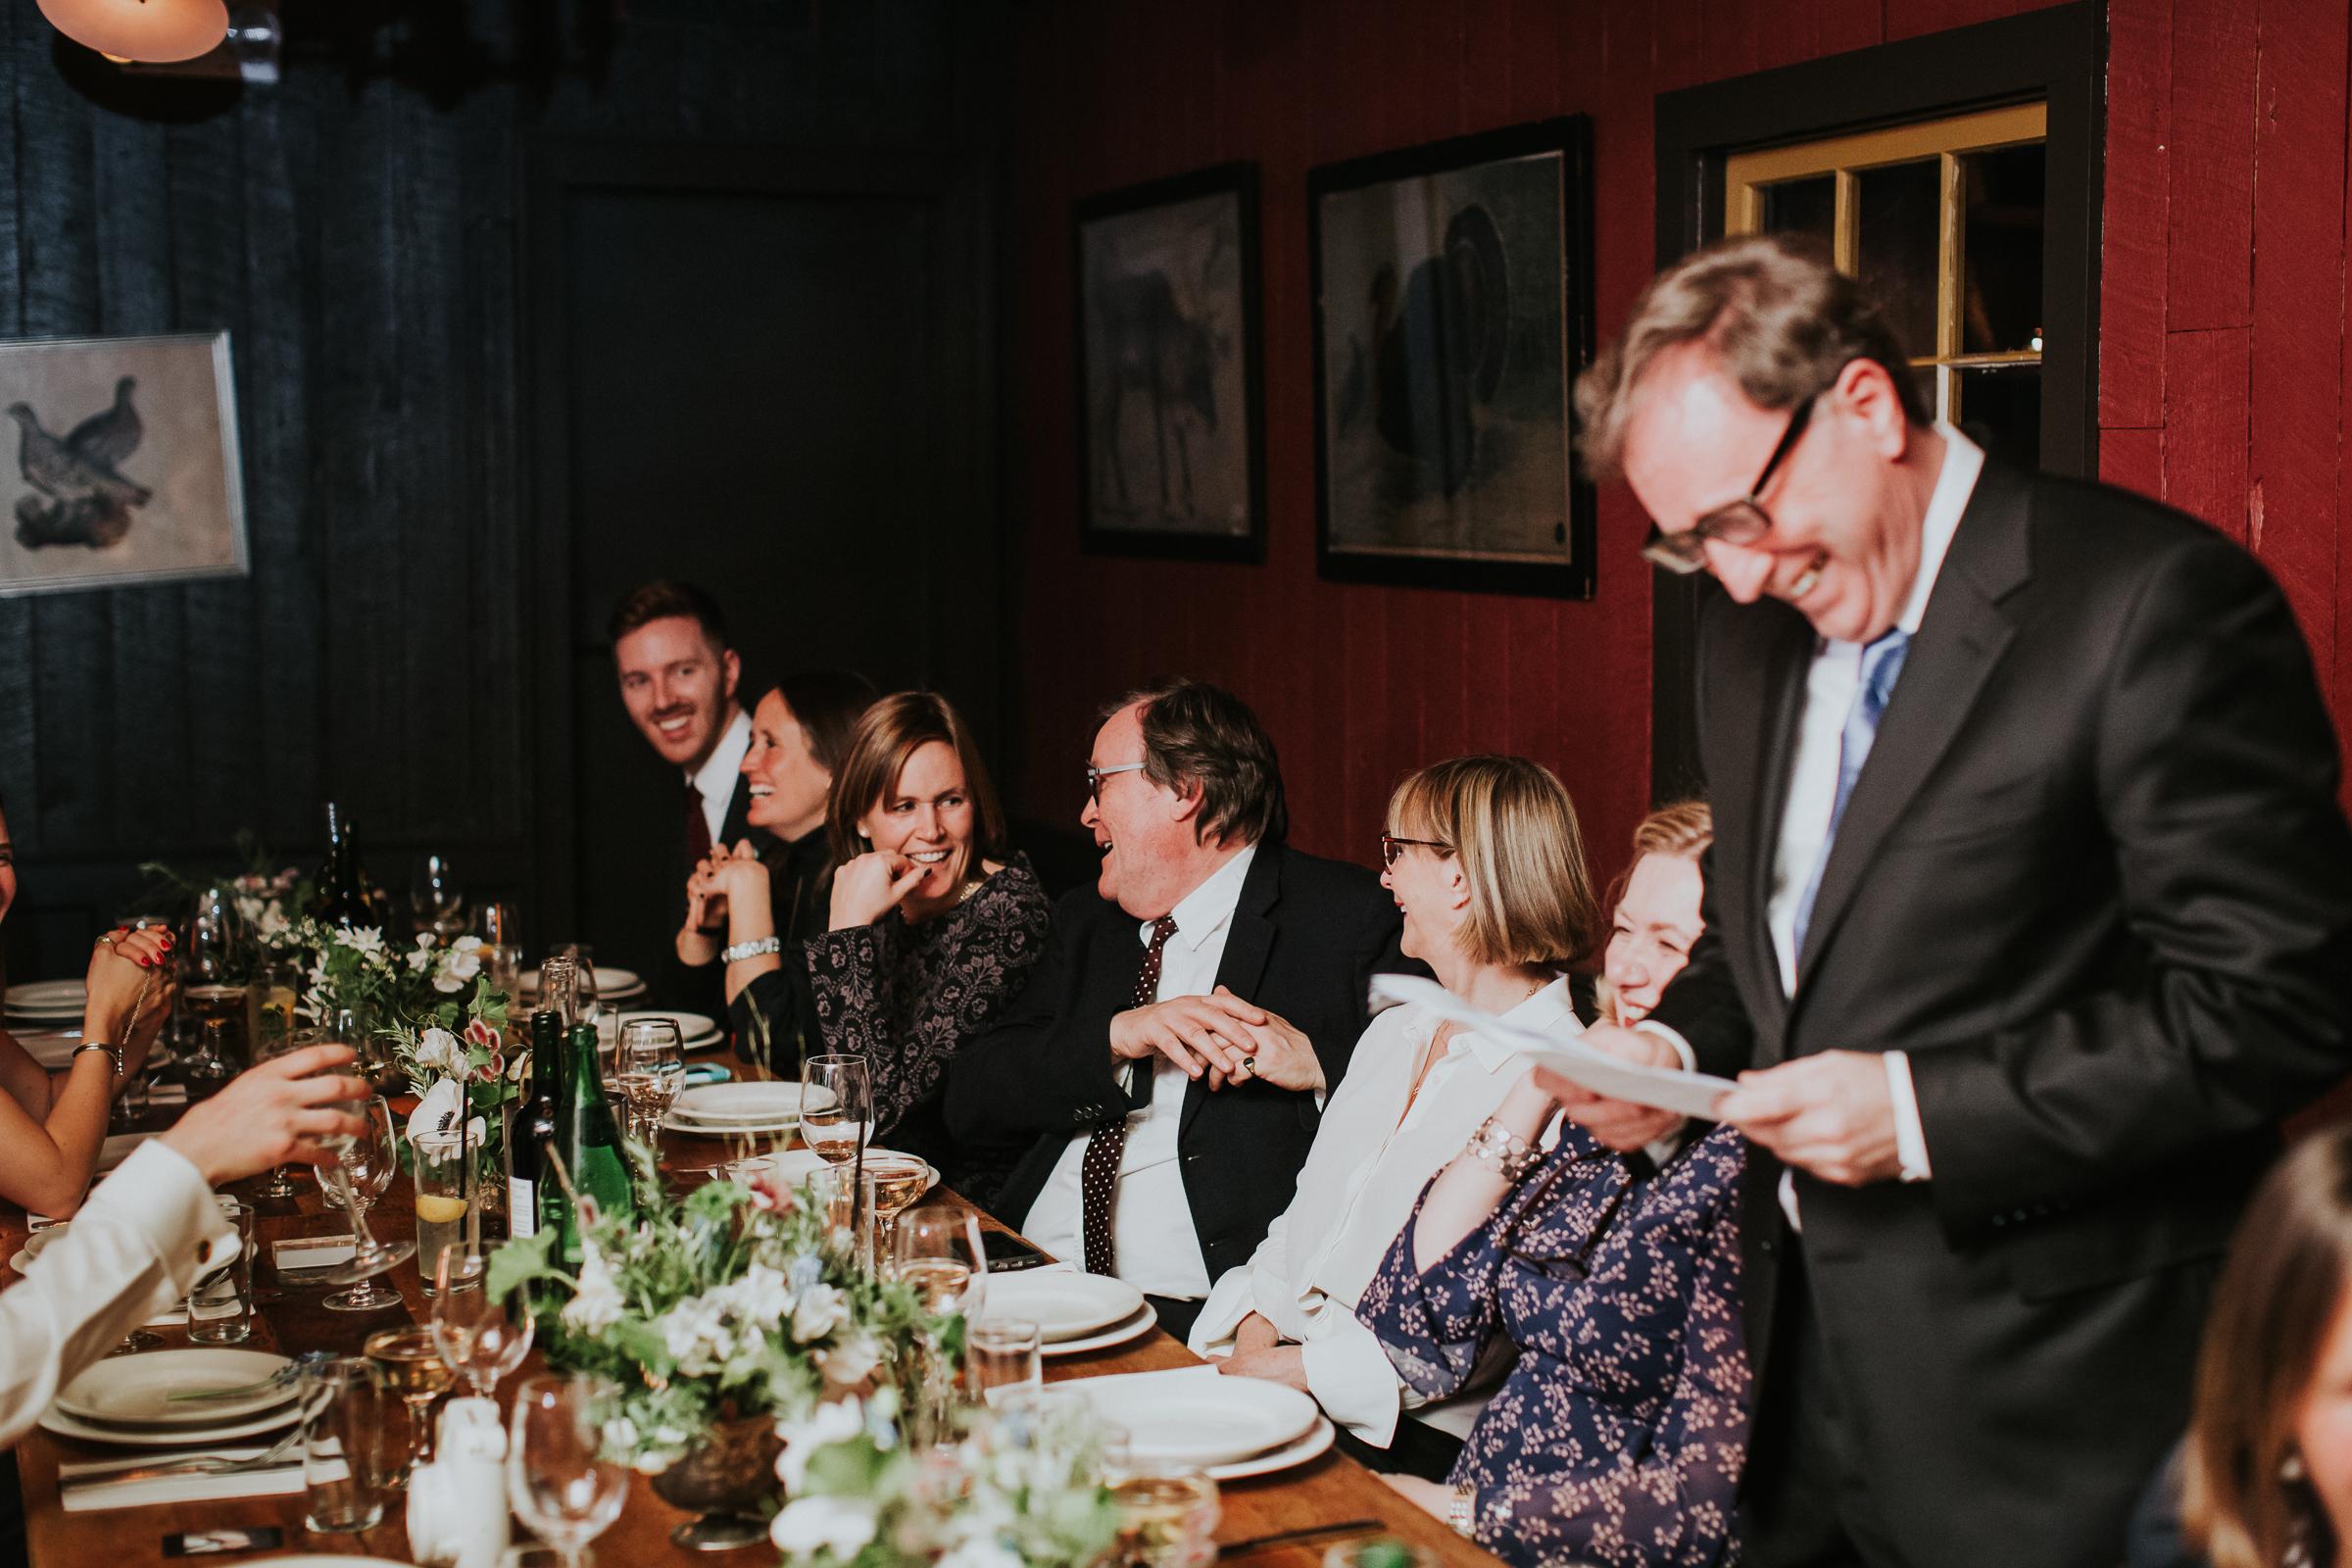 Freemans-Restaurant-Soho-Brooklyn-Bridge-Park-Dumbo-Documentary-Wedding-Photographer-59.jpg